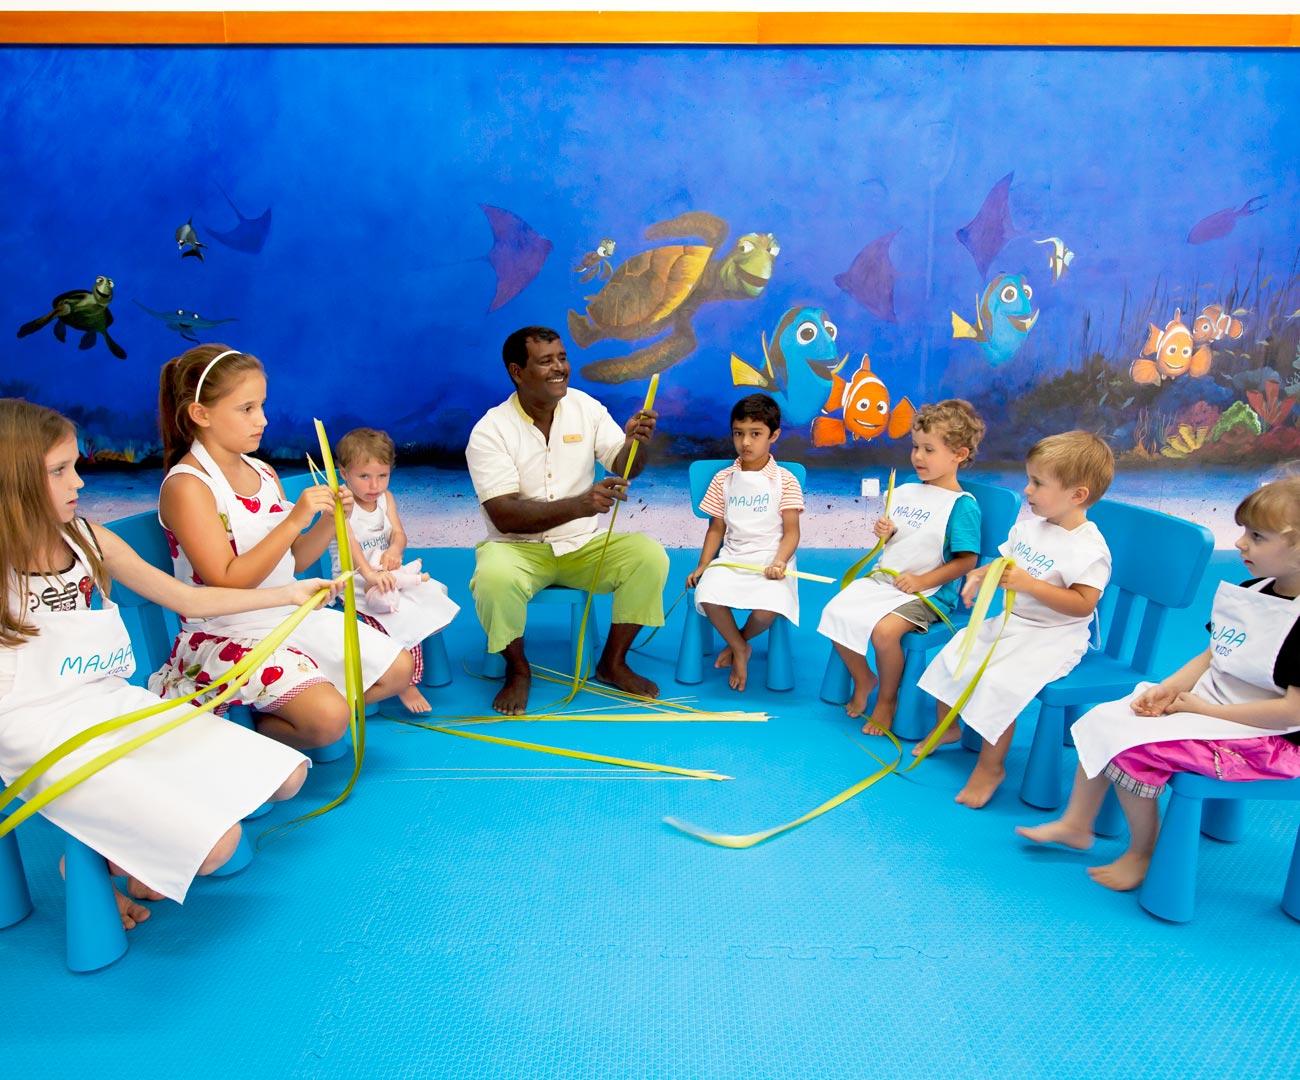 Majaa Kids' Club